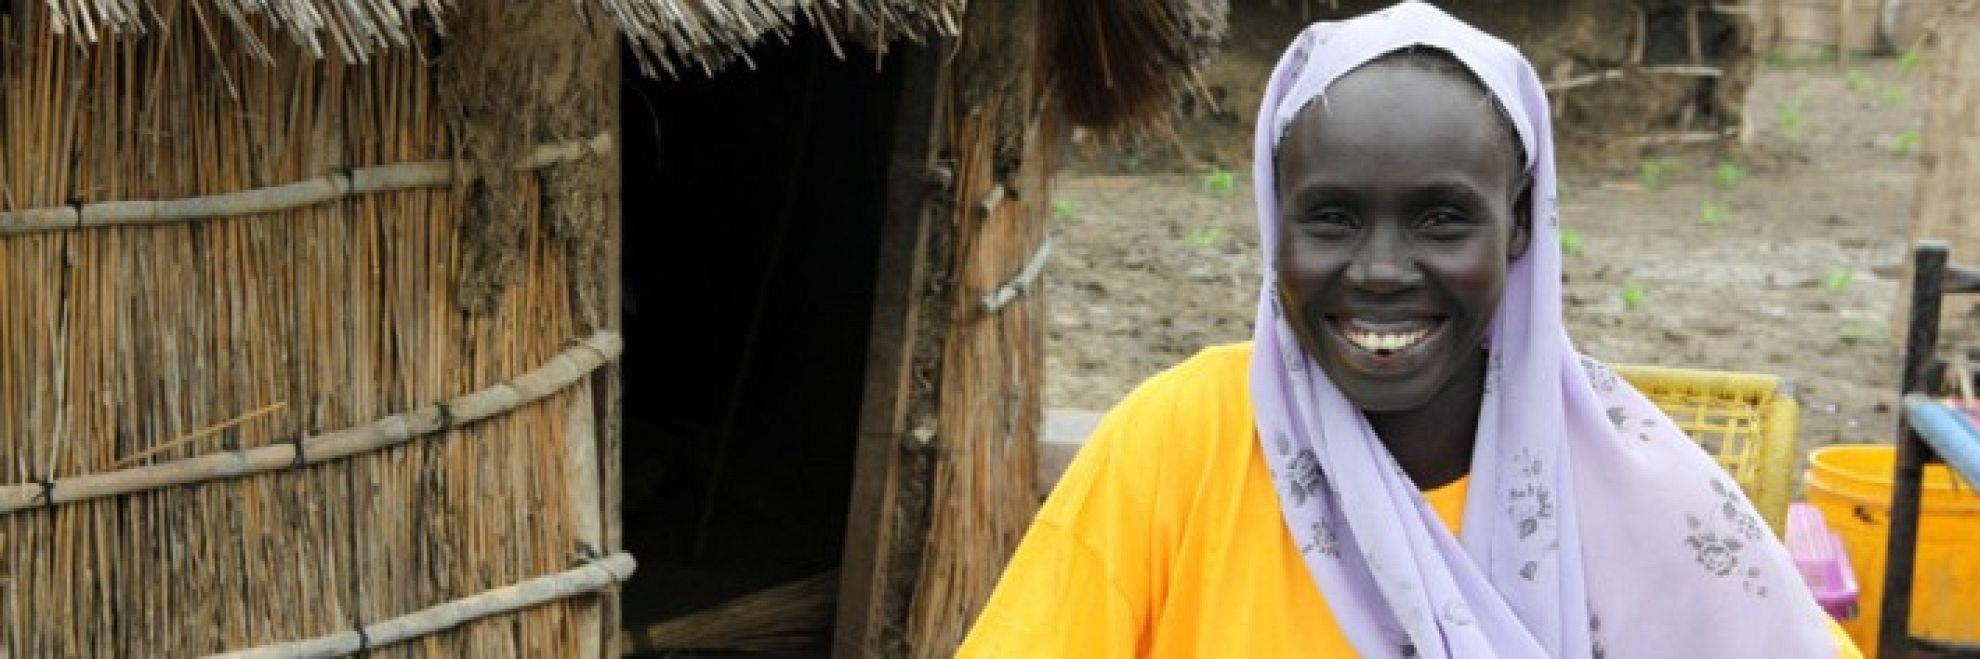 Latest News Malaria consortium produces annual review 2010 2011